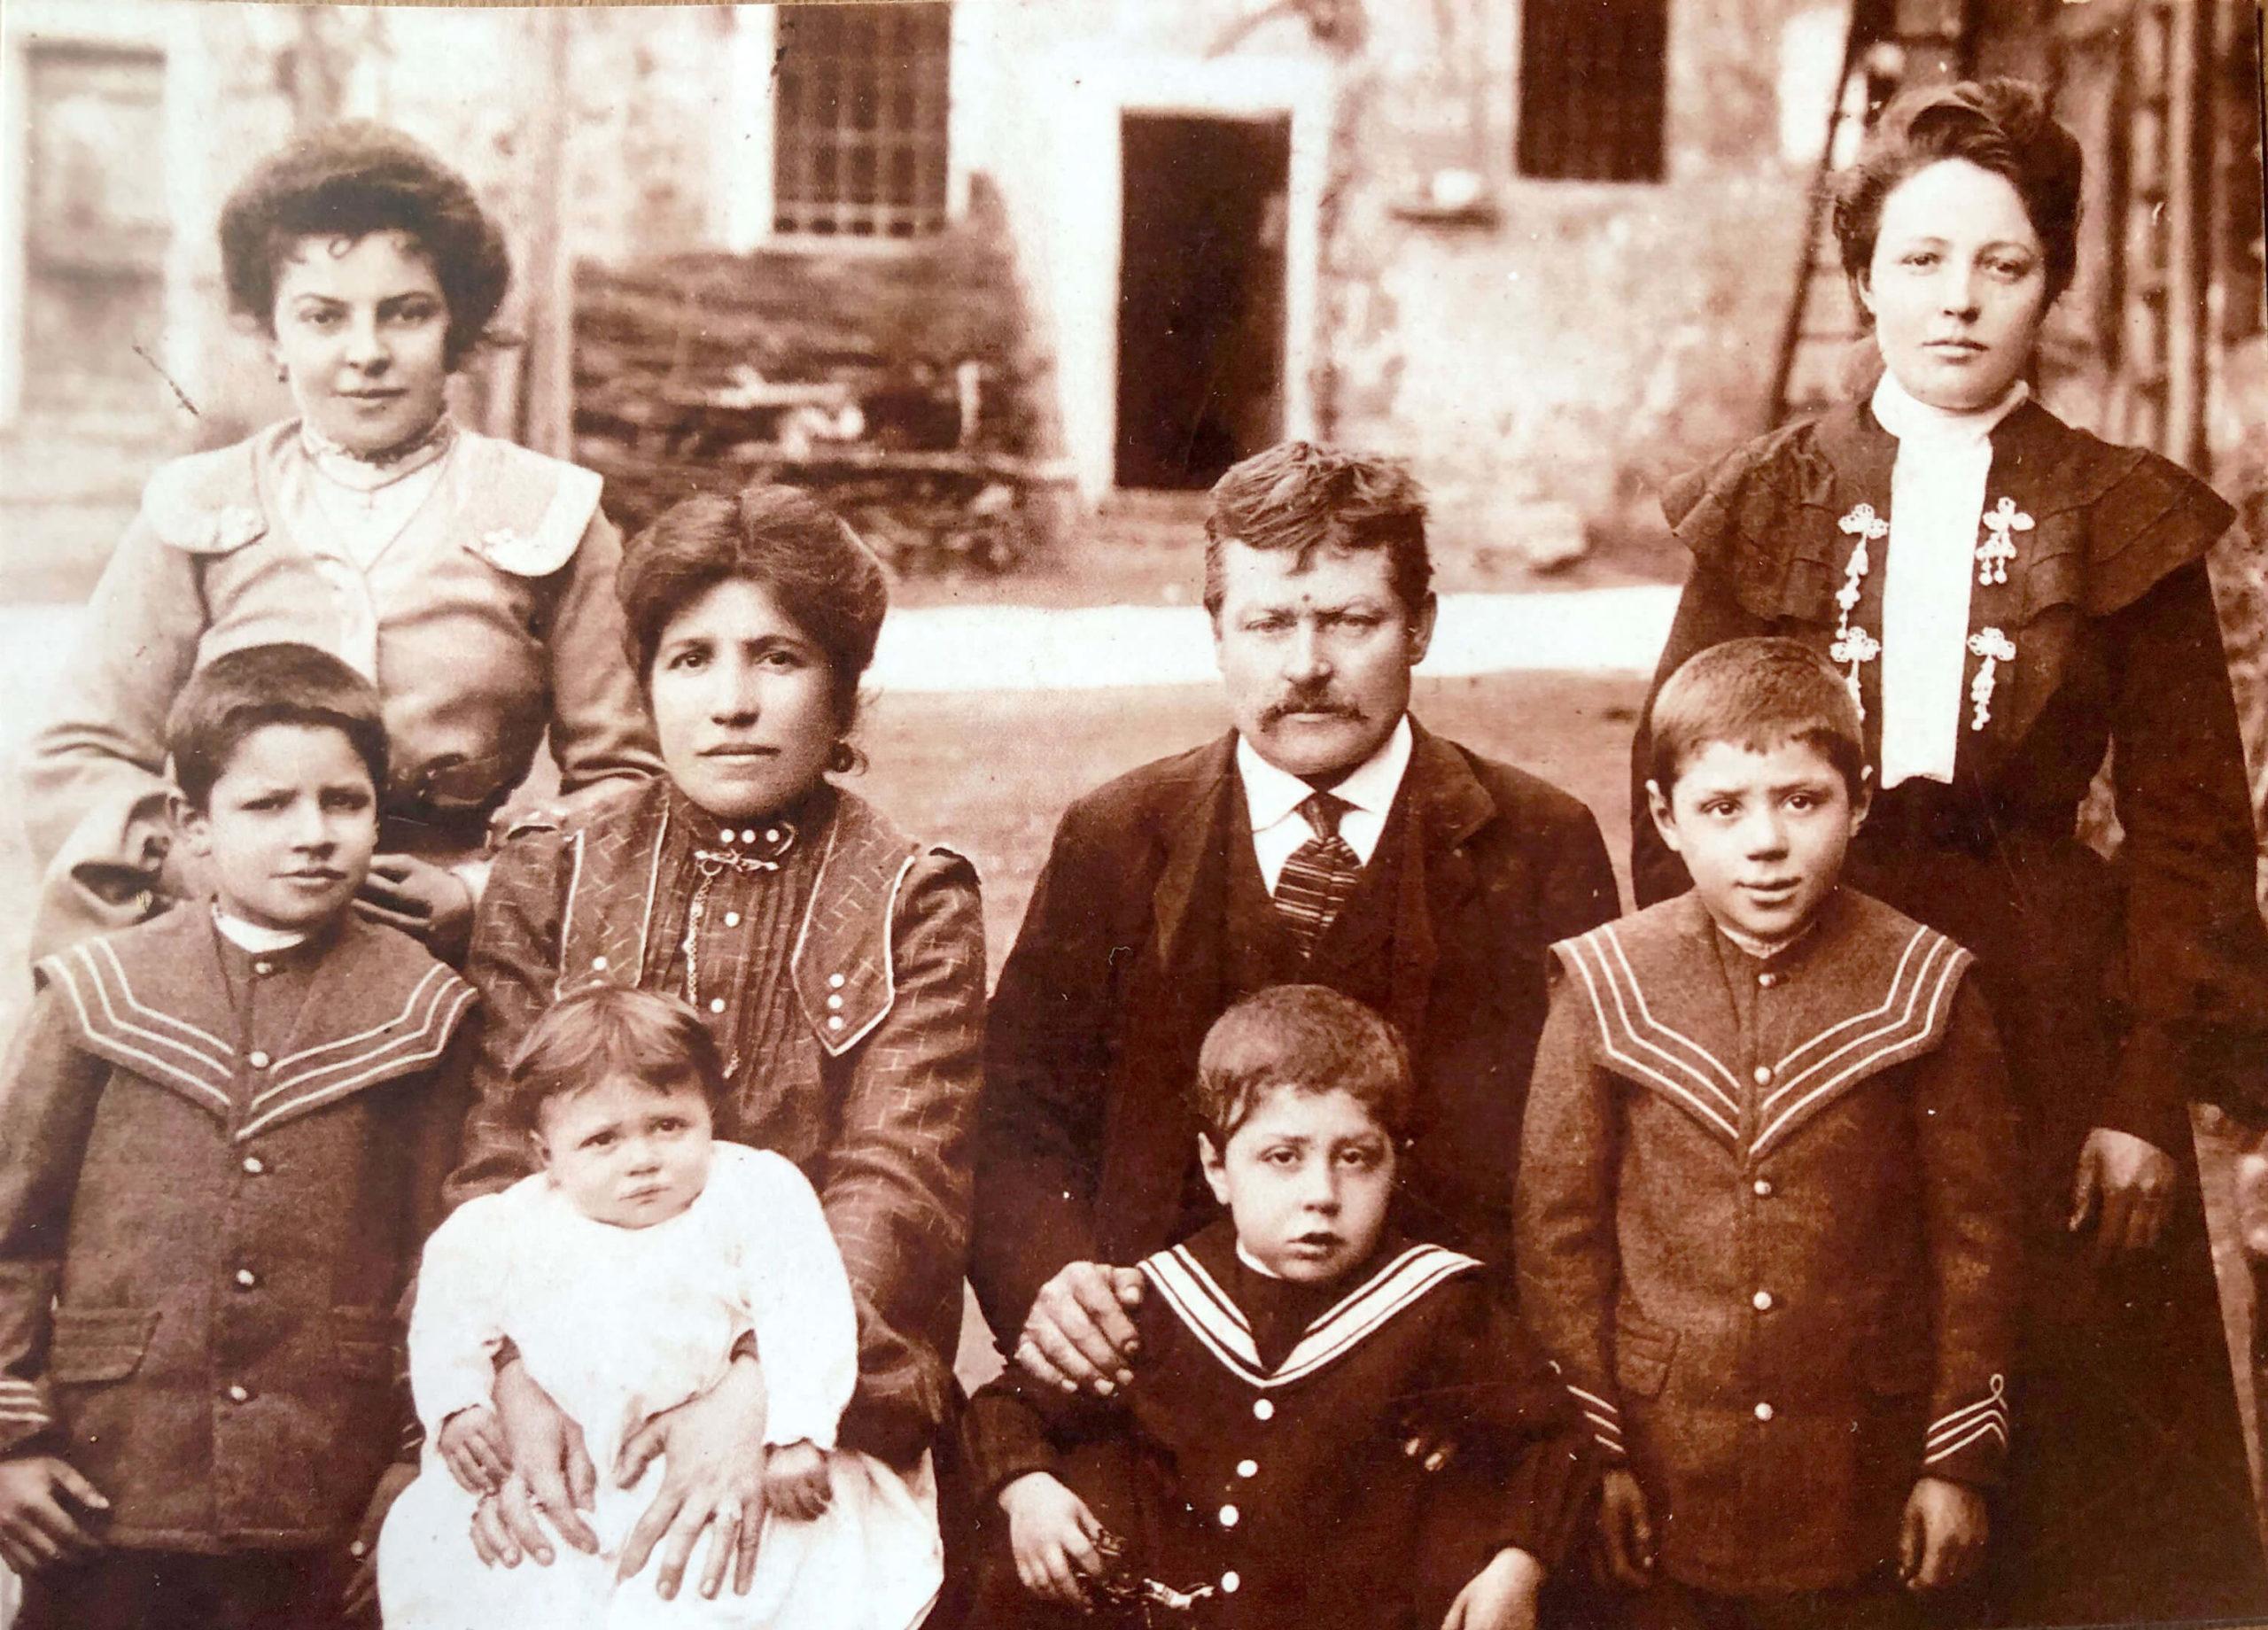 Famiglia-Venegoni-1908